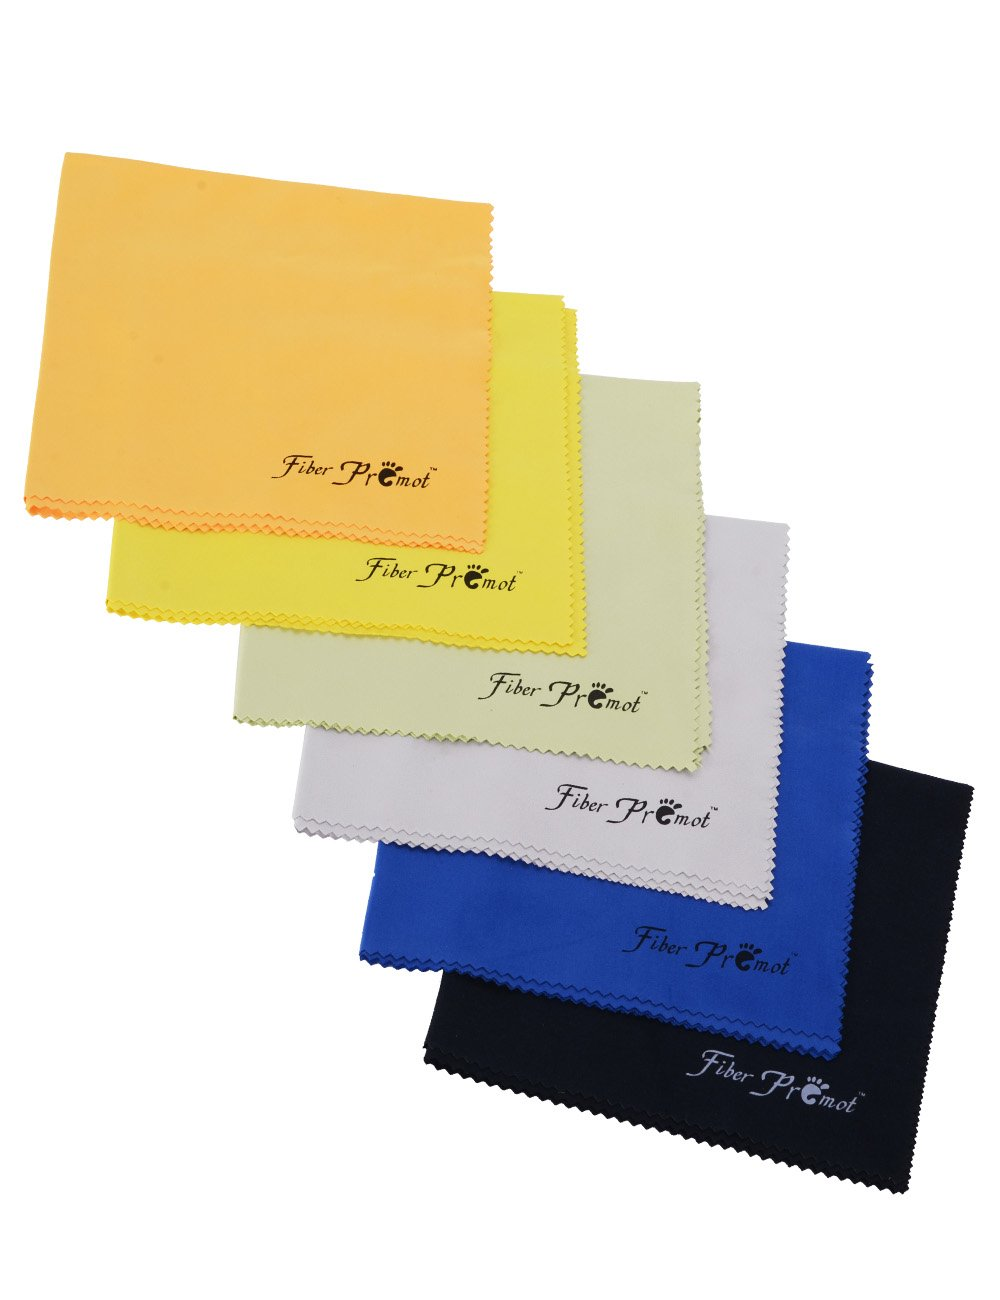 Fiber Promot 6 Pack Microfiber Cloth for Phone Screens Camera Glasses Lens Square Glasses Cleaning (Black,Grey,Royal Blue,Golden Yellow,Green,Orange,12''12'')